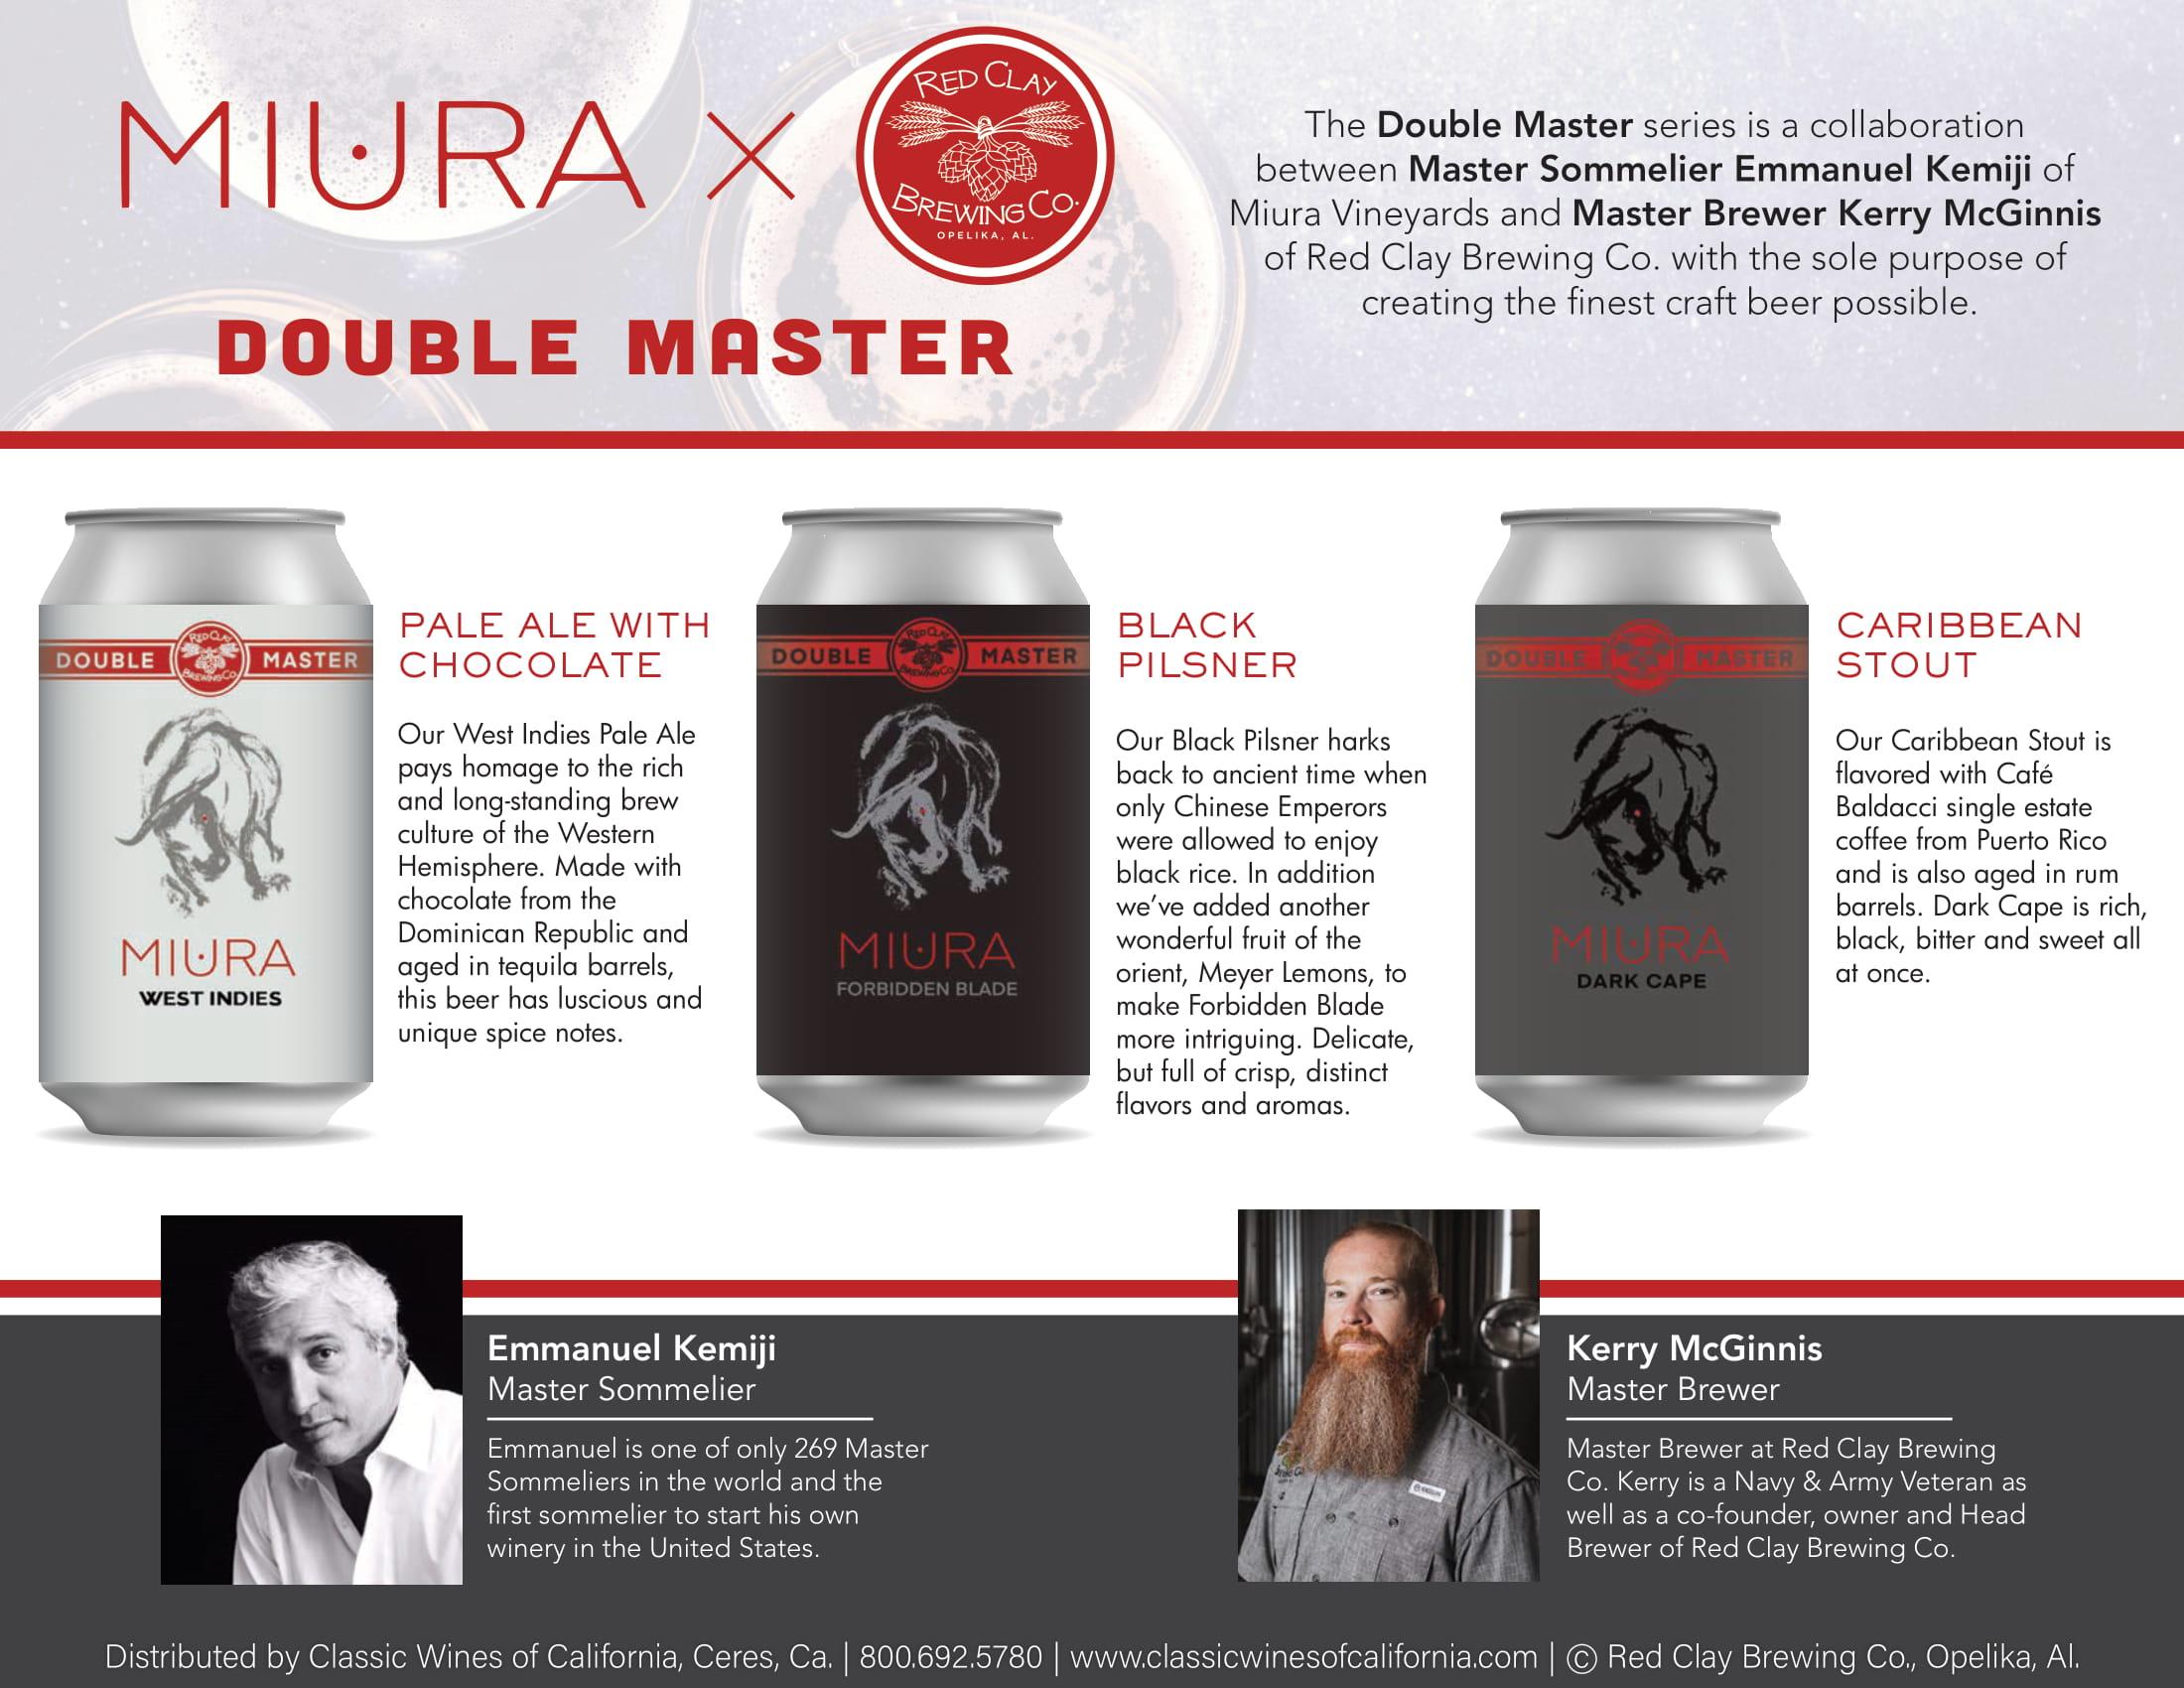 Miura Craft Beer Family Tech Sheet